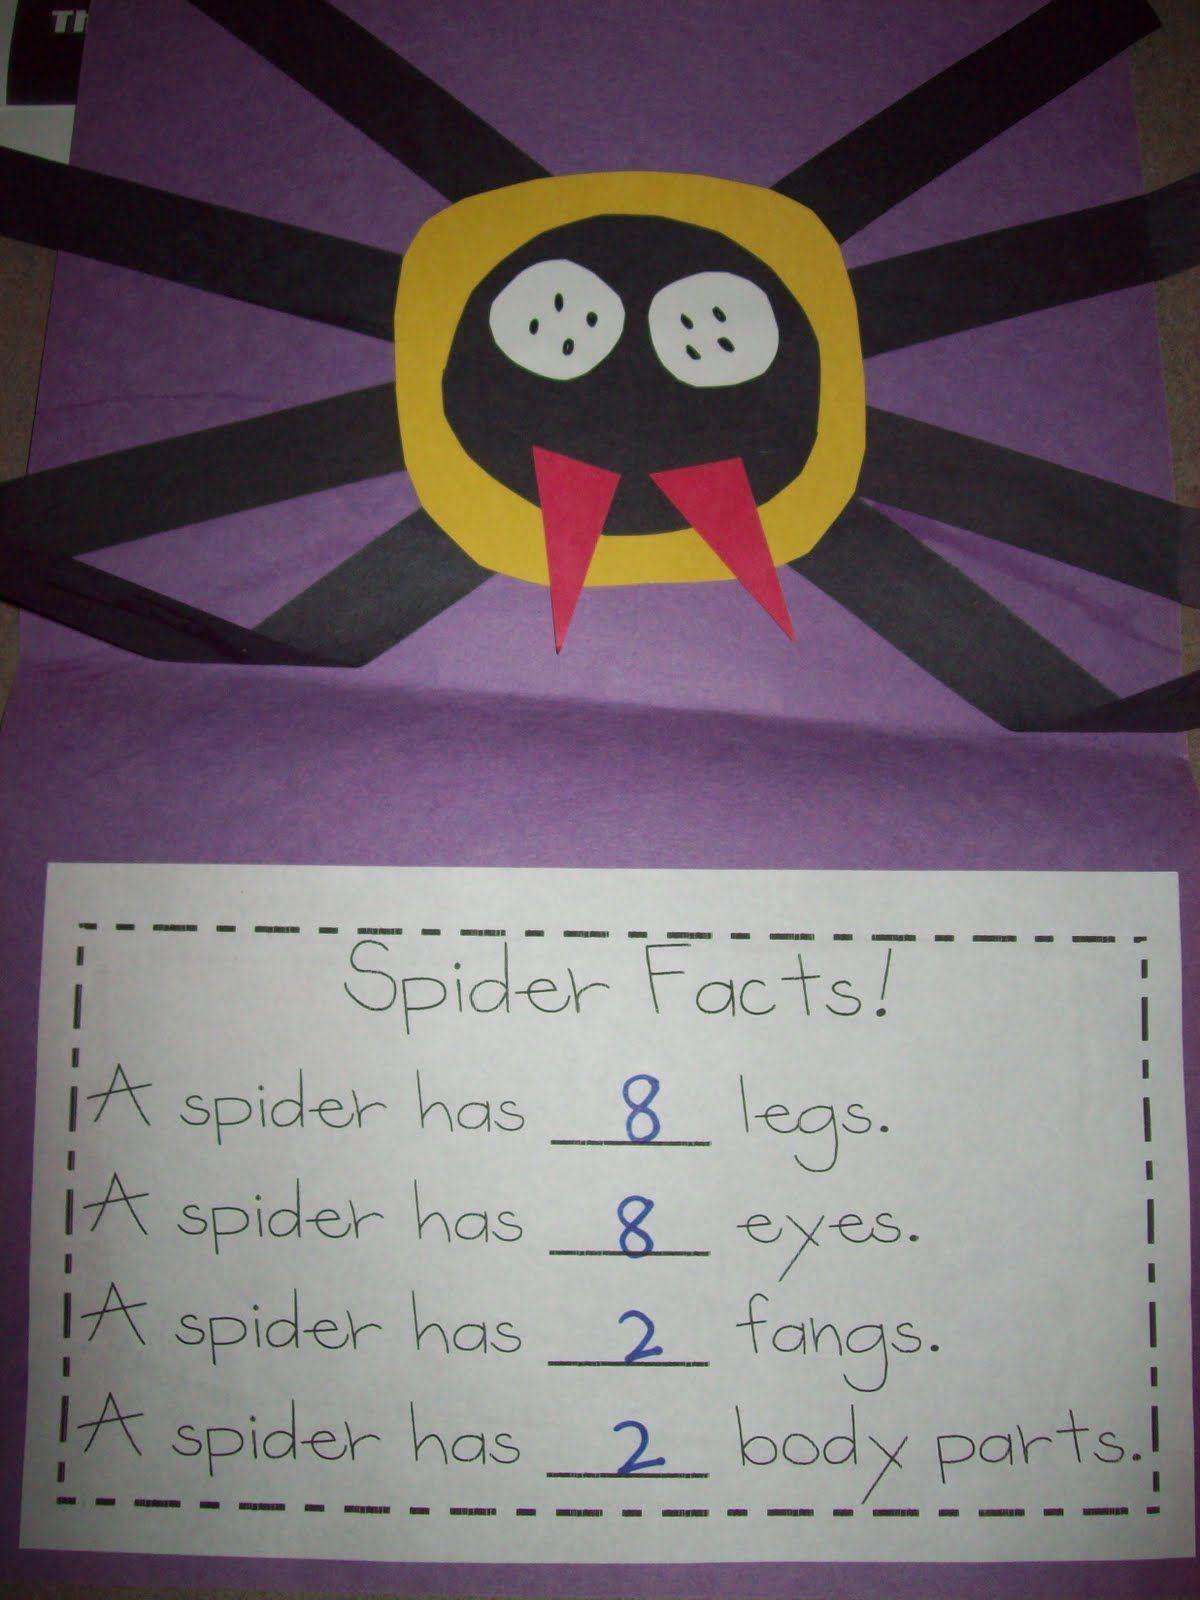 Spider Facts